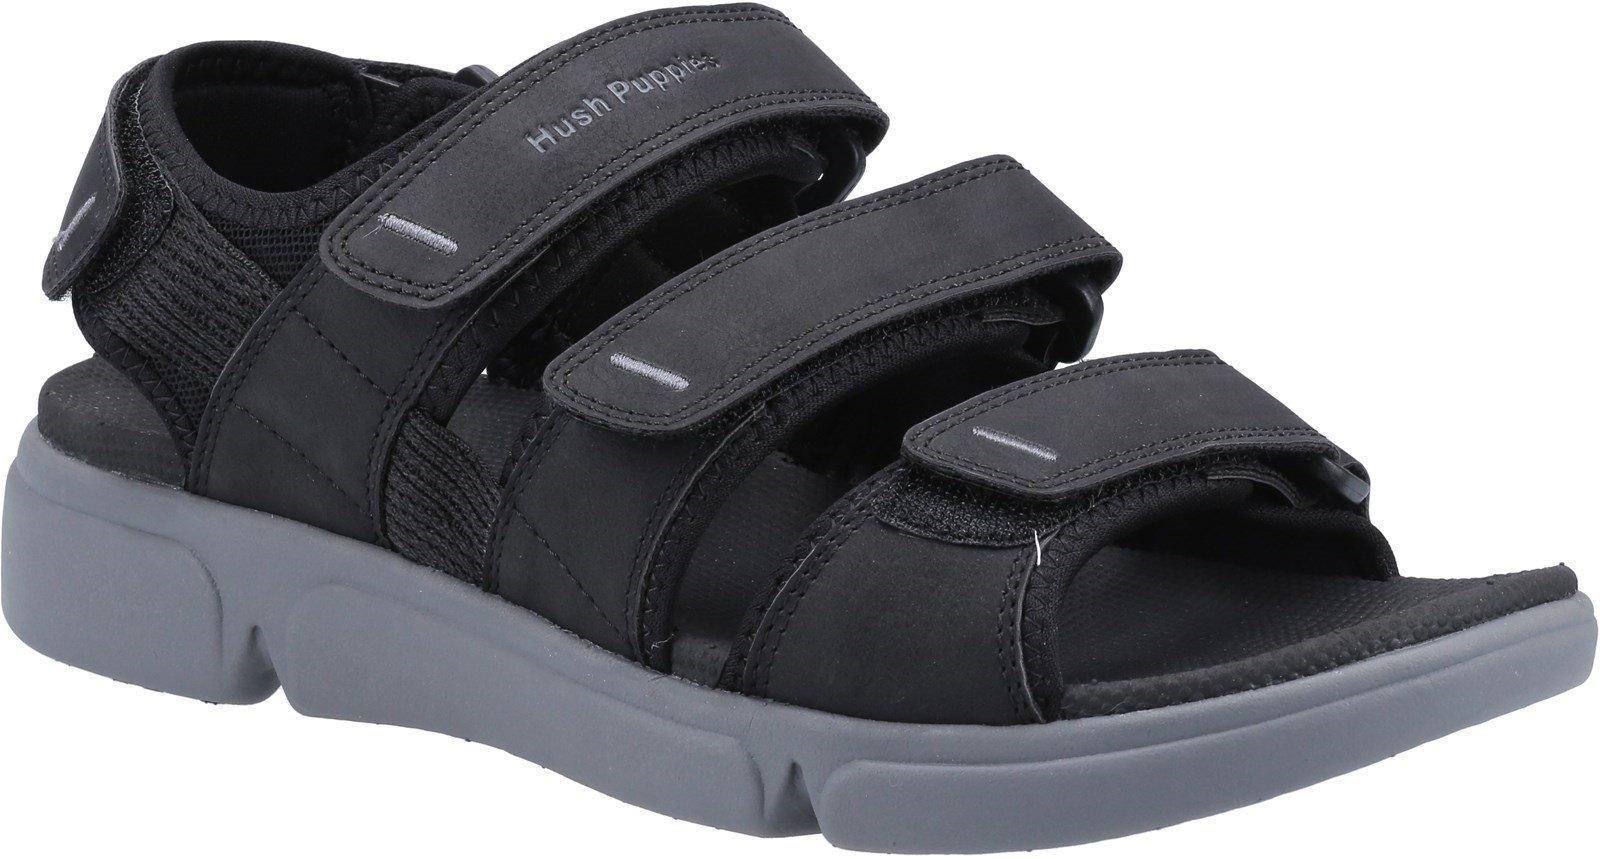 Hush Puppies Men's Raul Multi Velcro Sandal Various Colours 31983 - Black 6